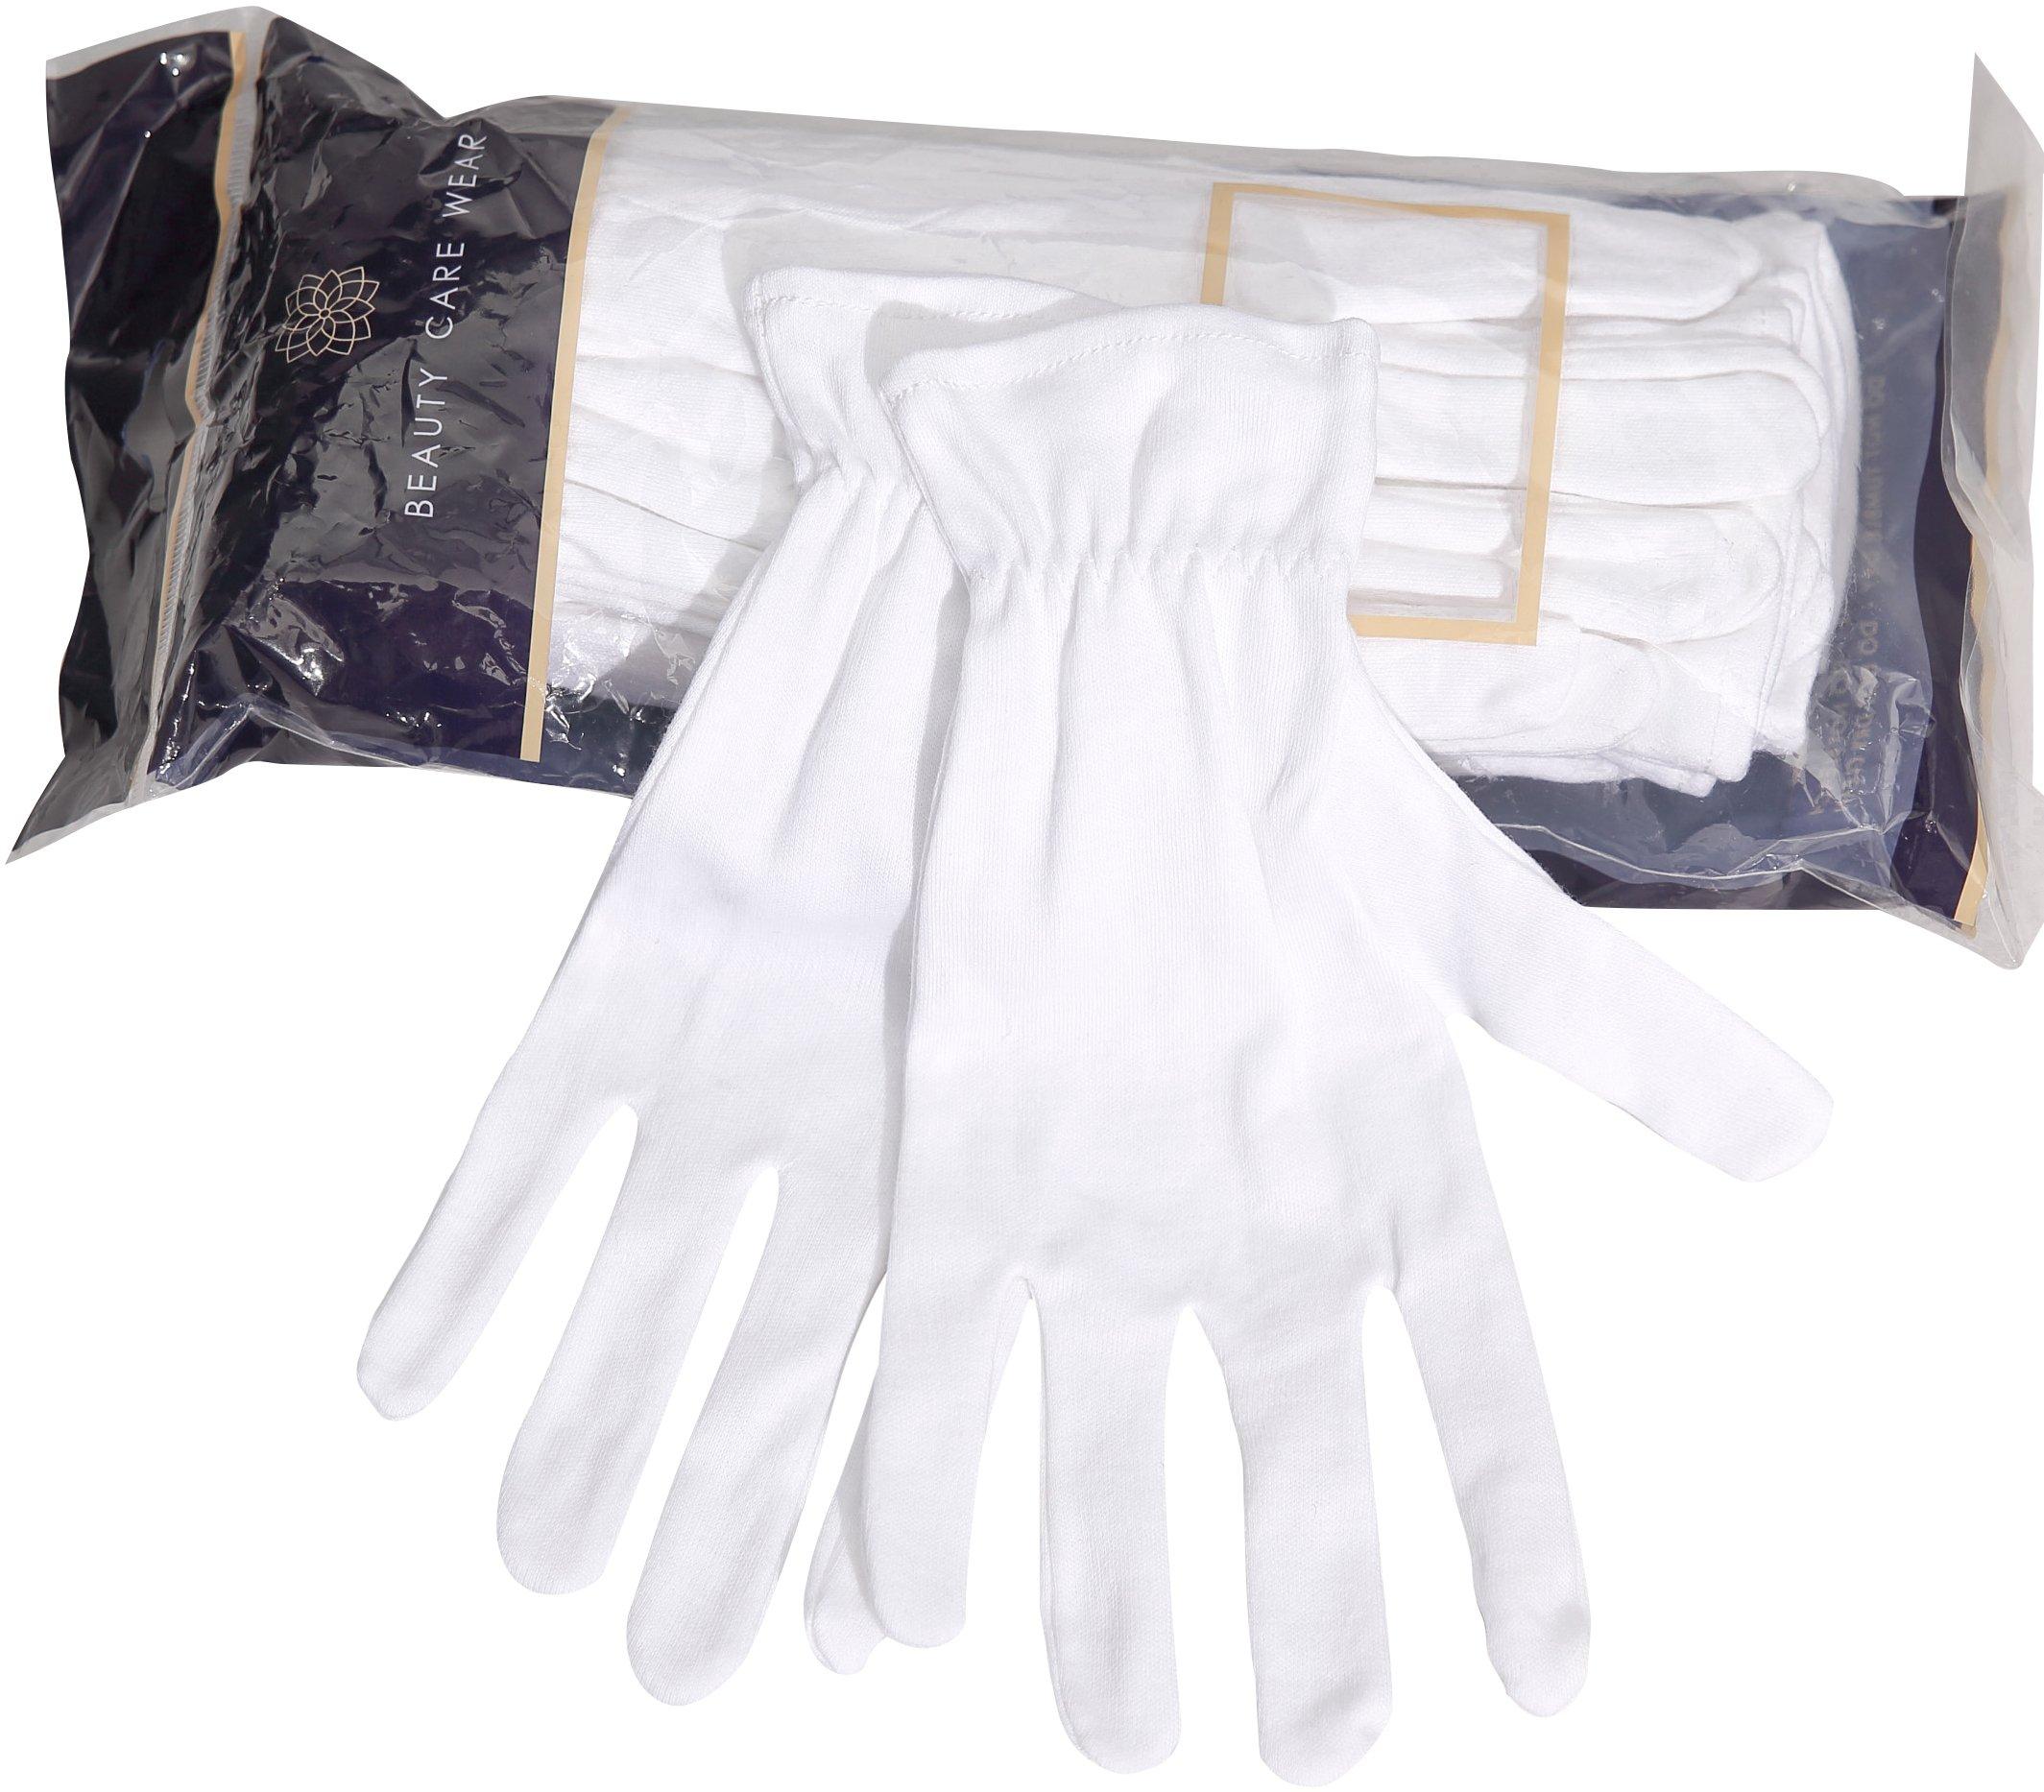 Beauty Care Wear Medium White Cotton Gloves for Eczema, Dry Skin, & Moisturizing - 20 Gloves